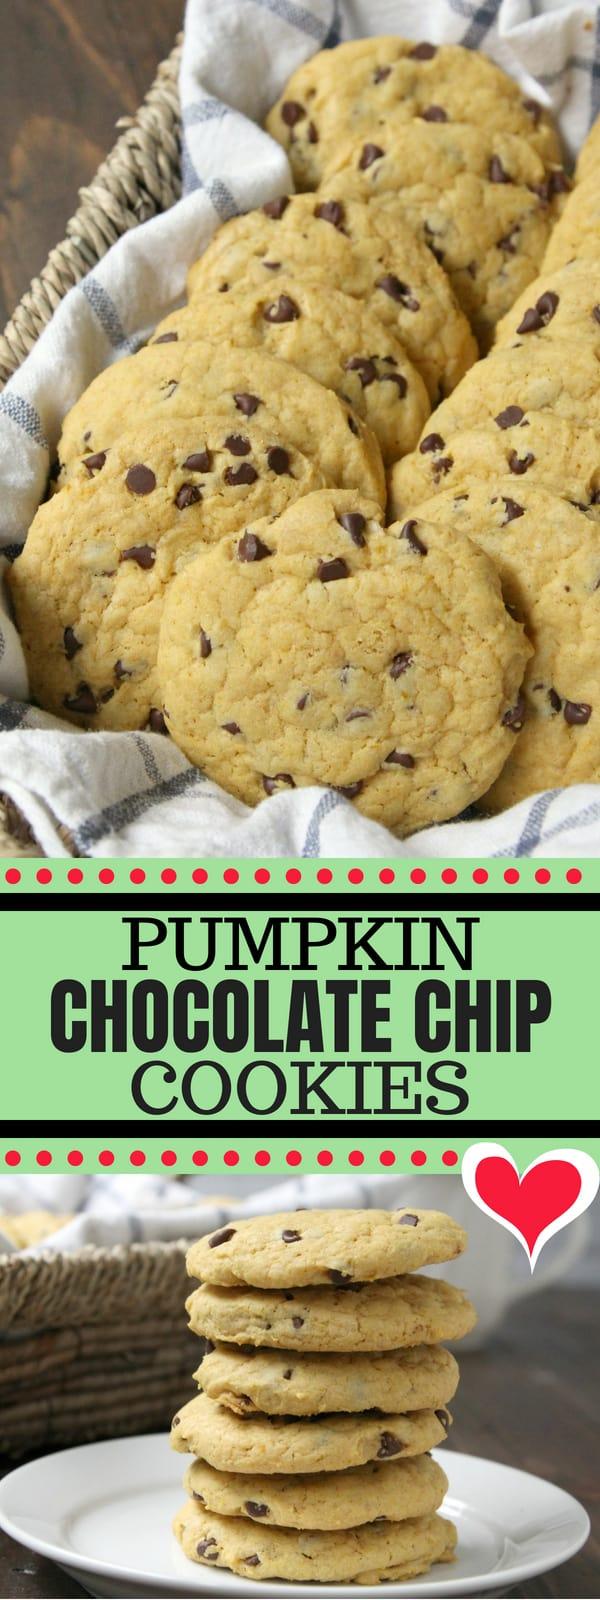 Pumpkin Chocolate Chip Cookies - easy from scratch pumpkin cookie recipe